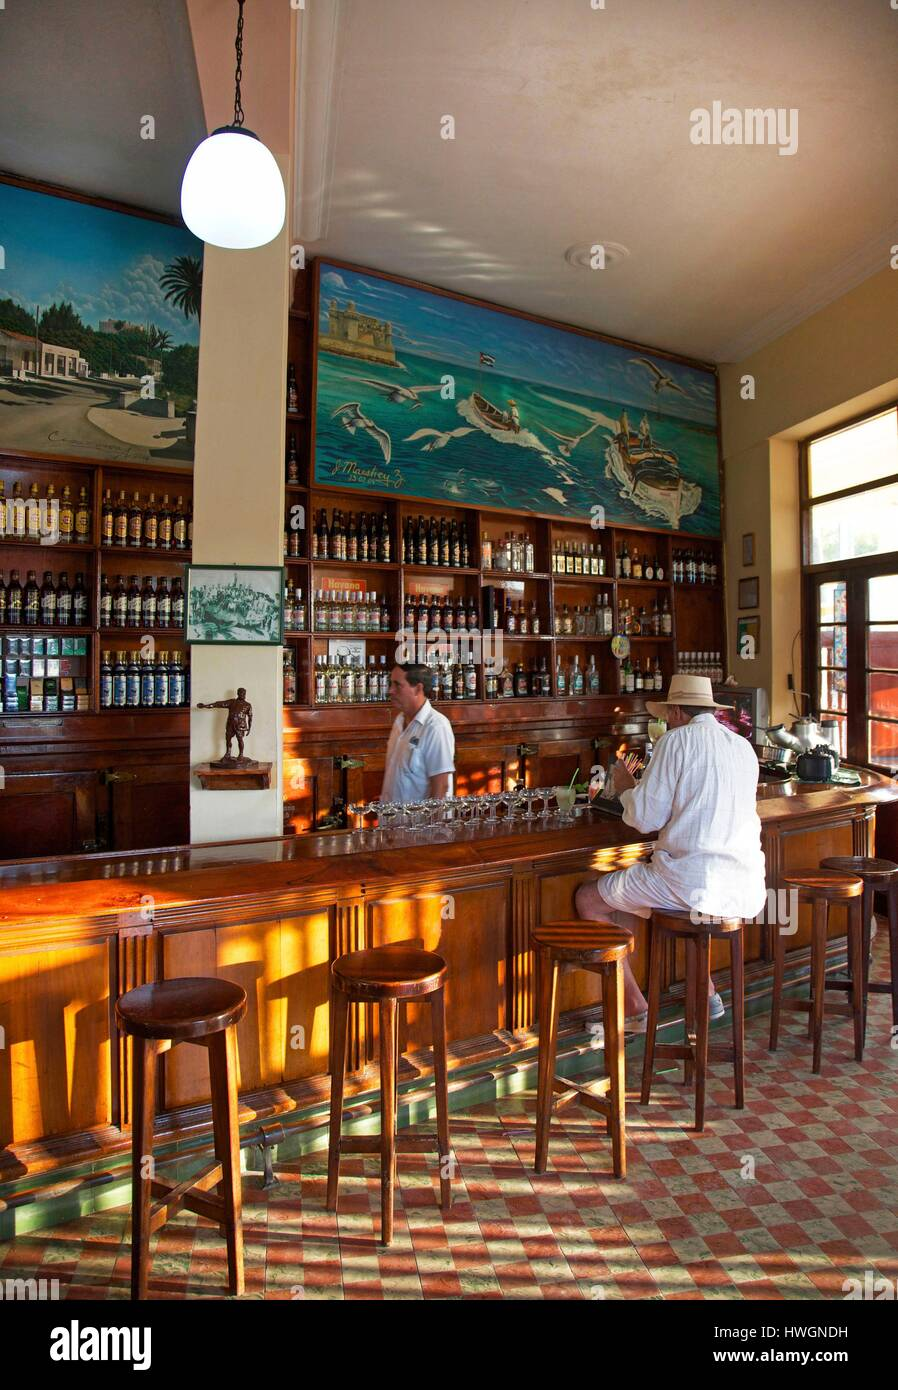 Cuba Cojimar Terraza De Cojimar Man At The Counter Of The